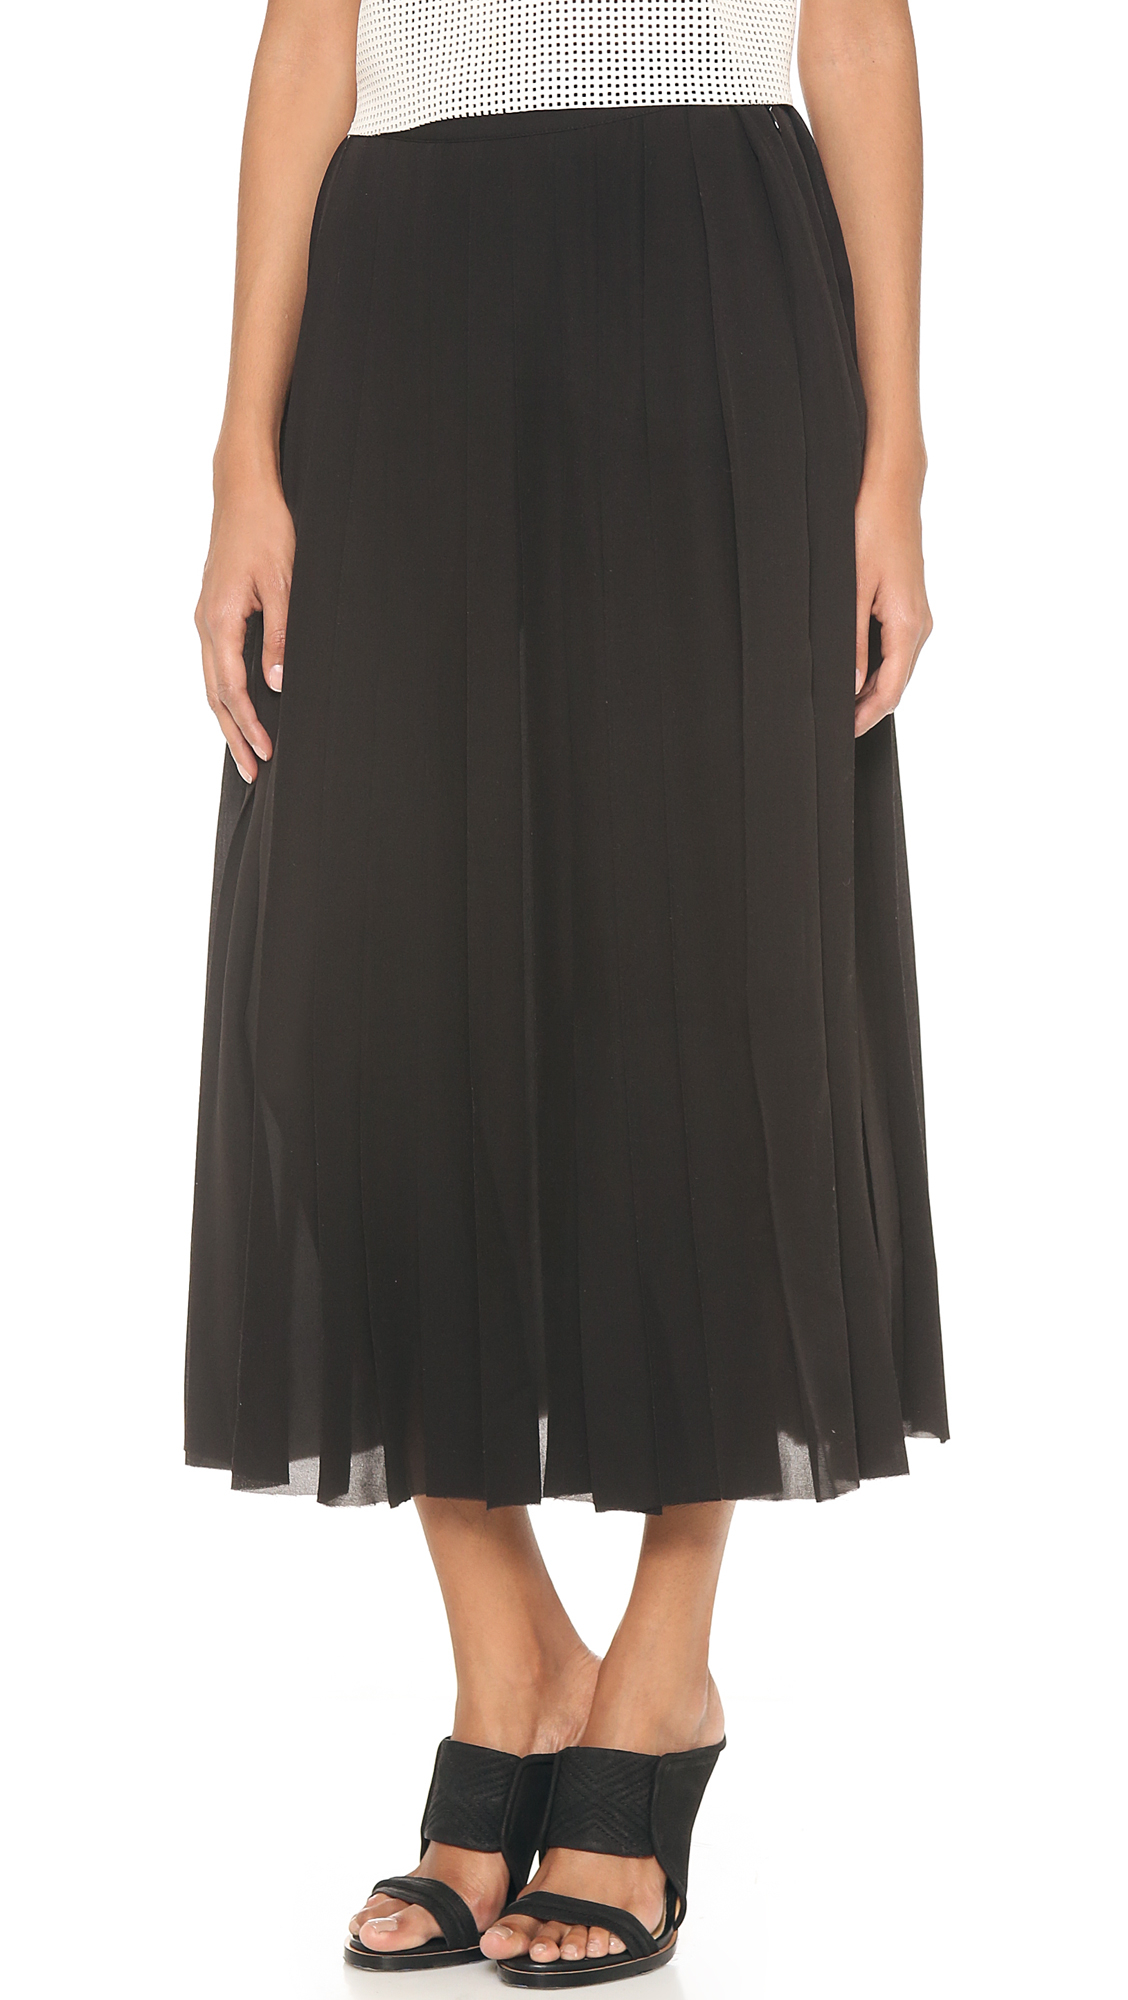 blk dnm silk pleated skirt in black lyst